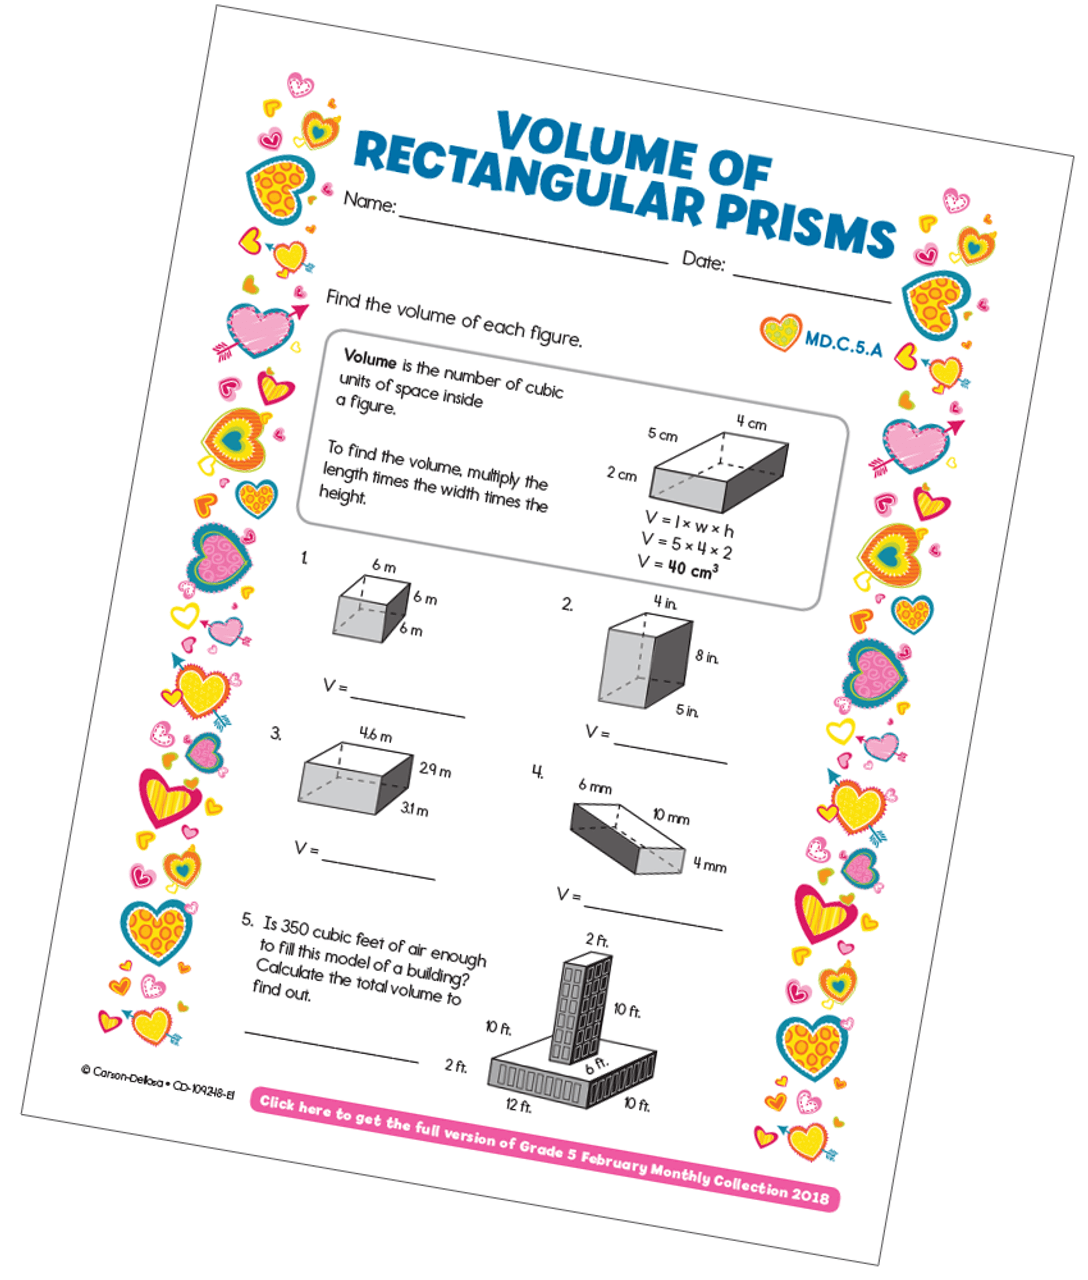 hight resolution of Volume of Rectangular Prisms Free Printable   Carson Dellosa